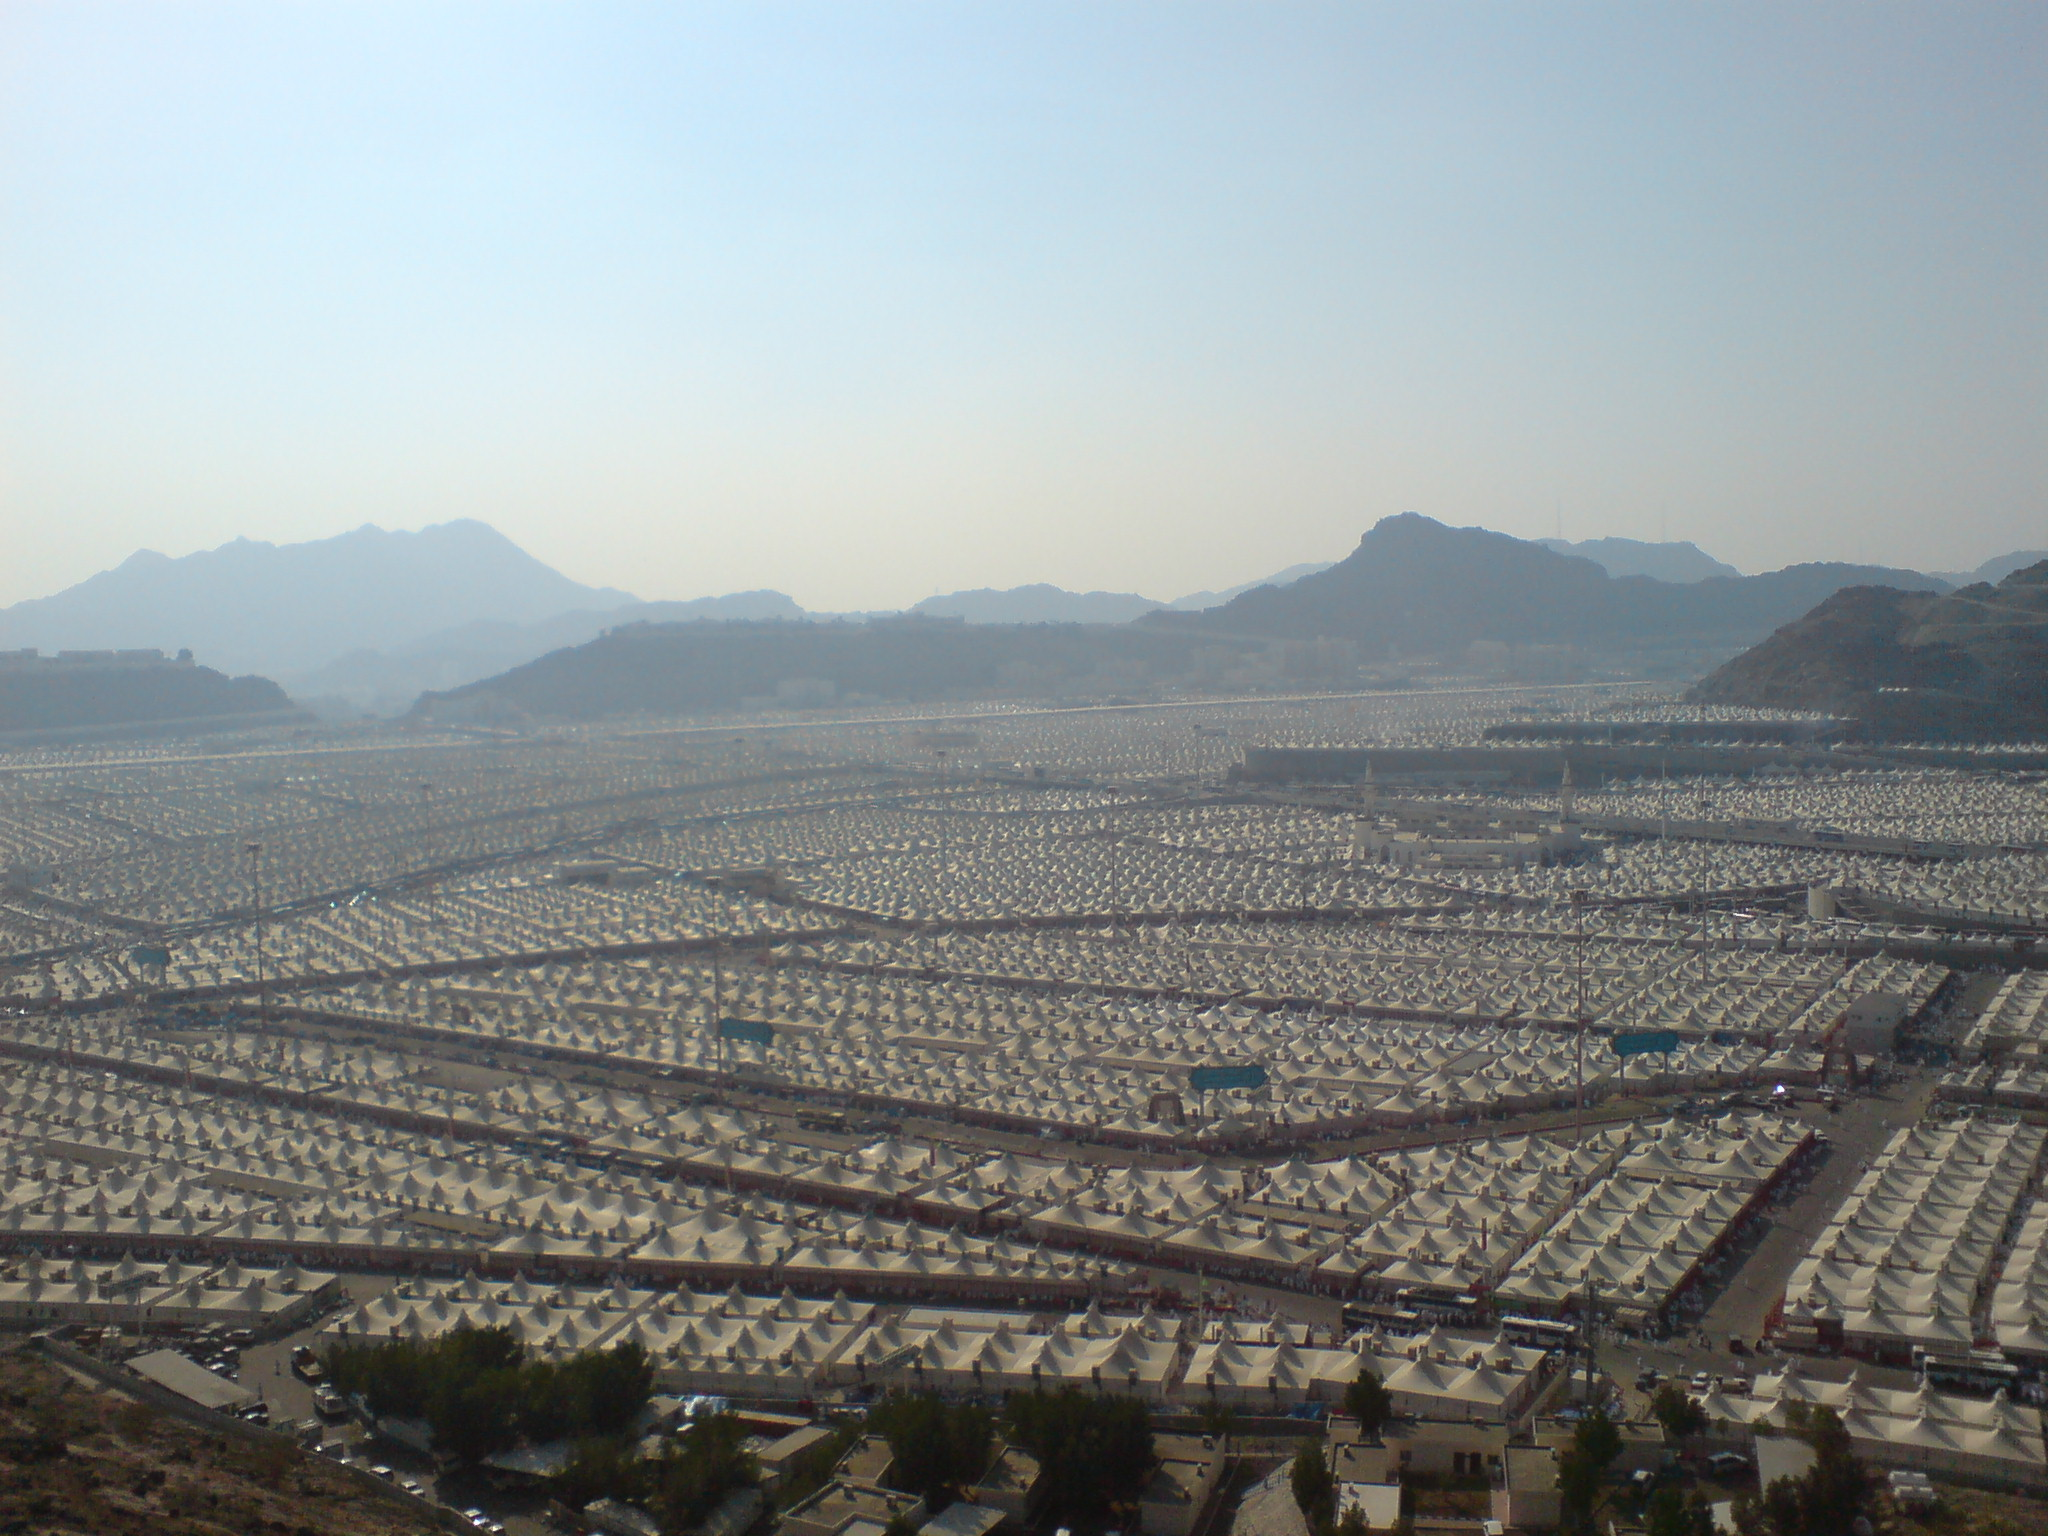 Mina Arábia Saudita Wikipédia A Enciclopédia Livre